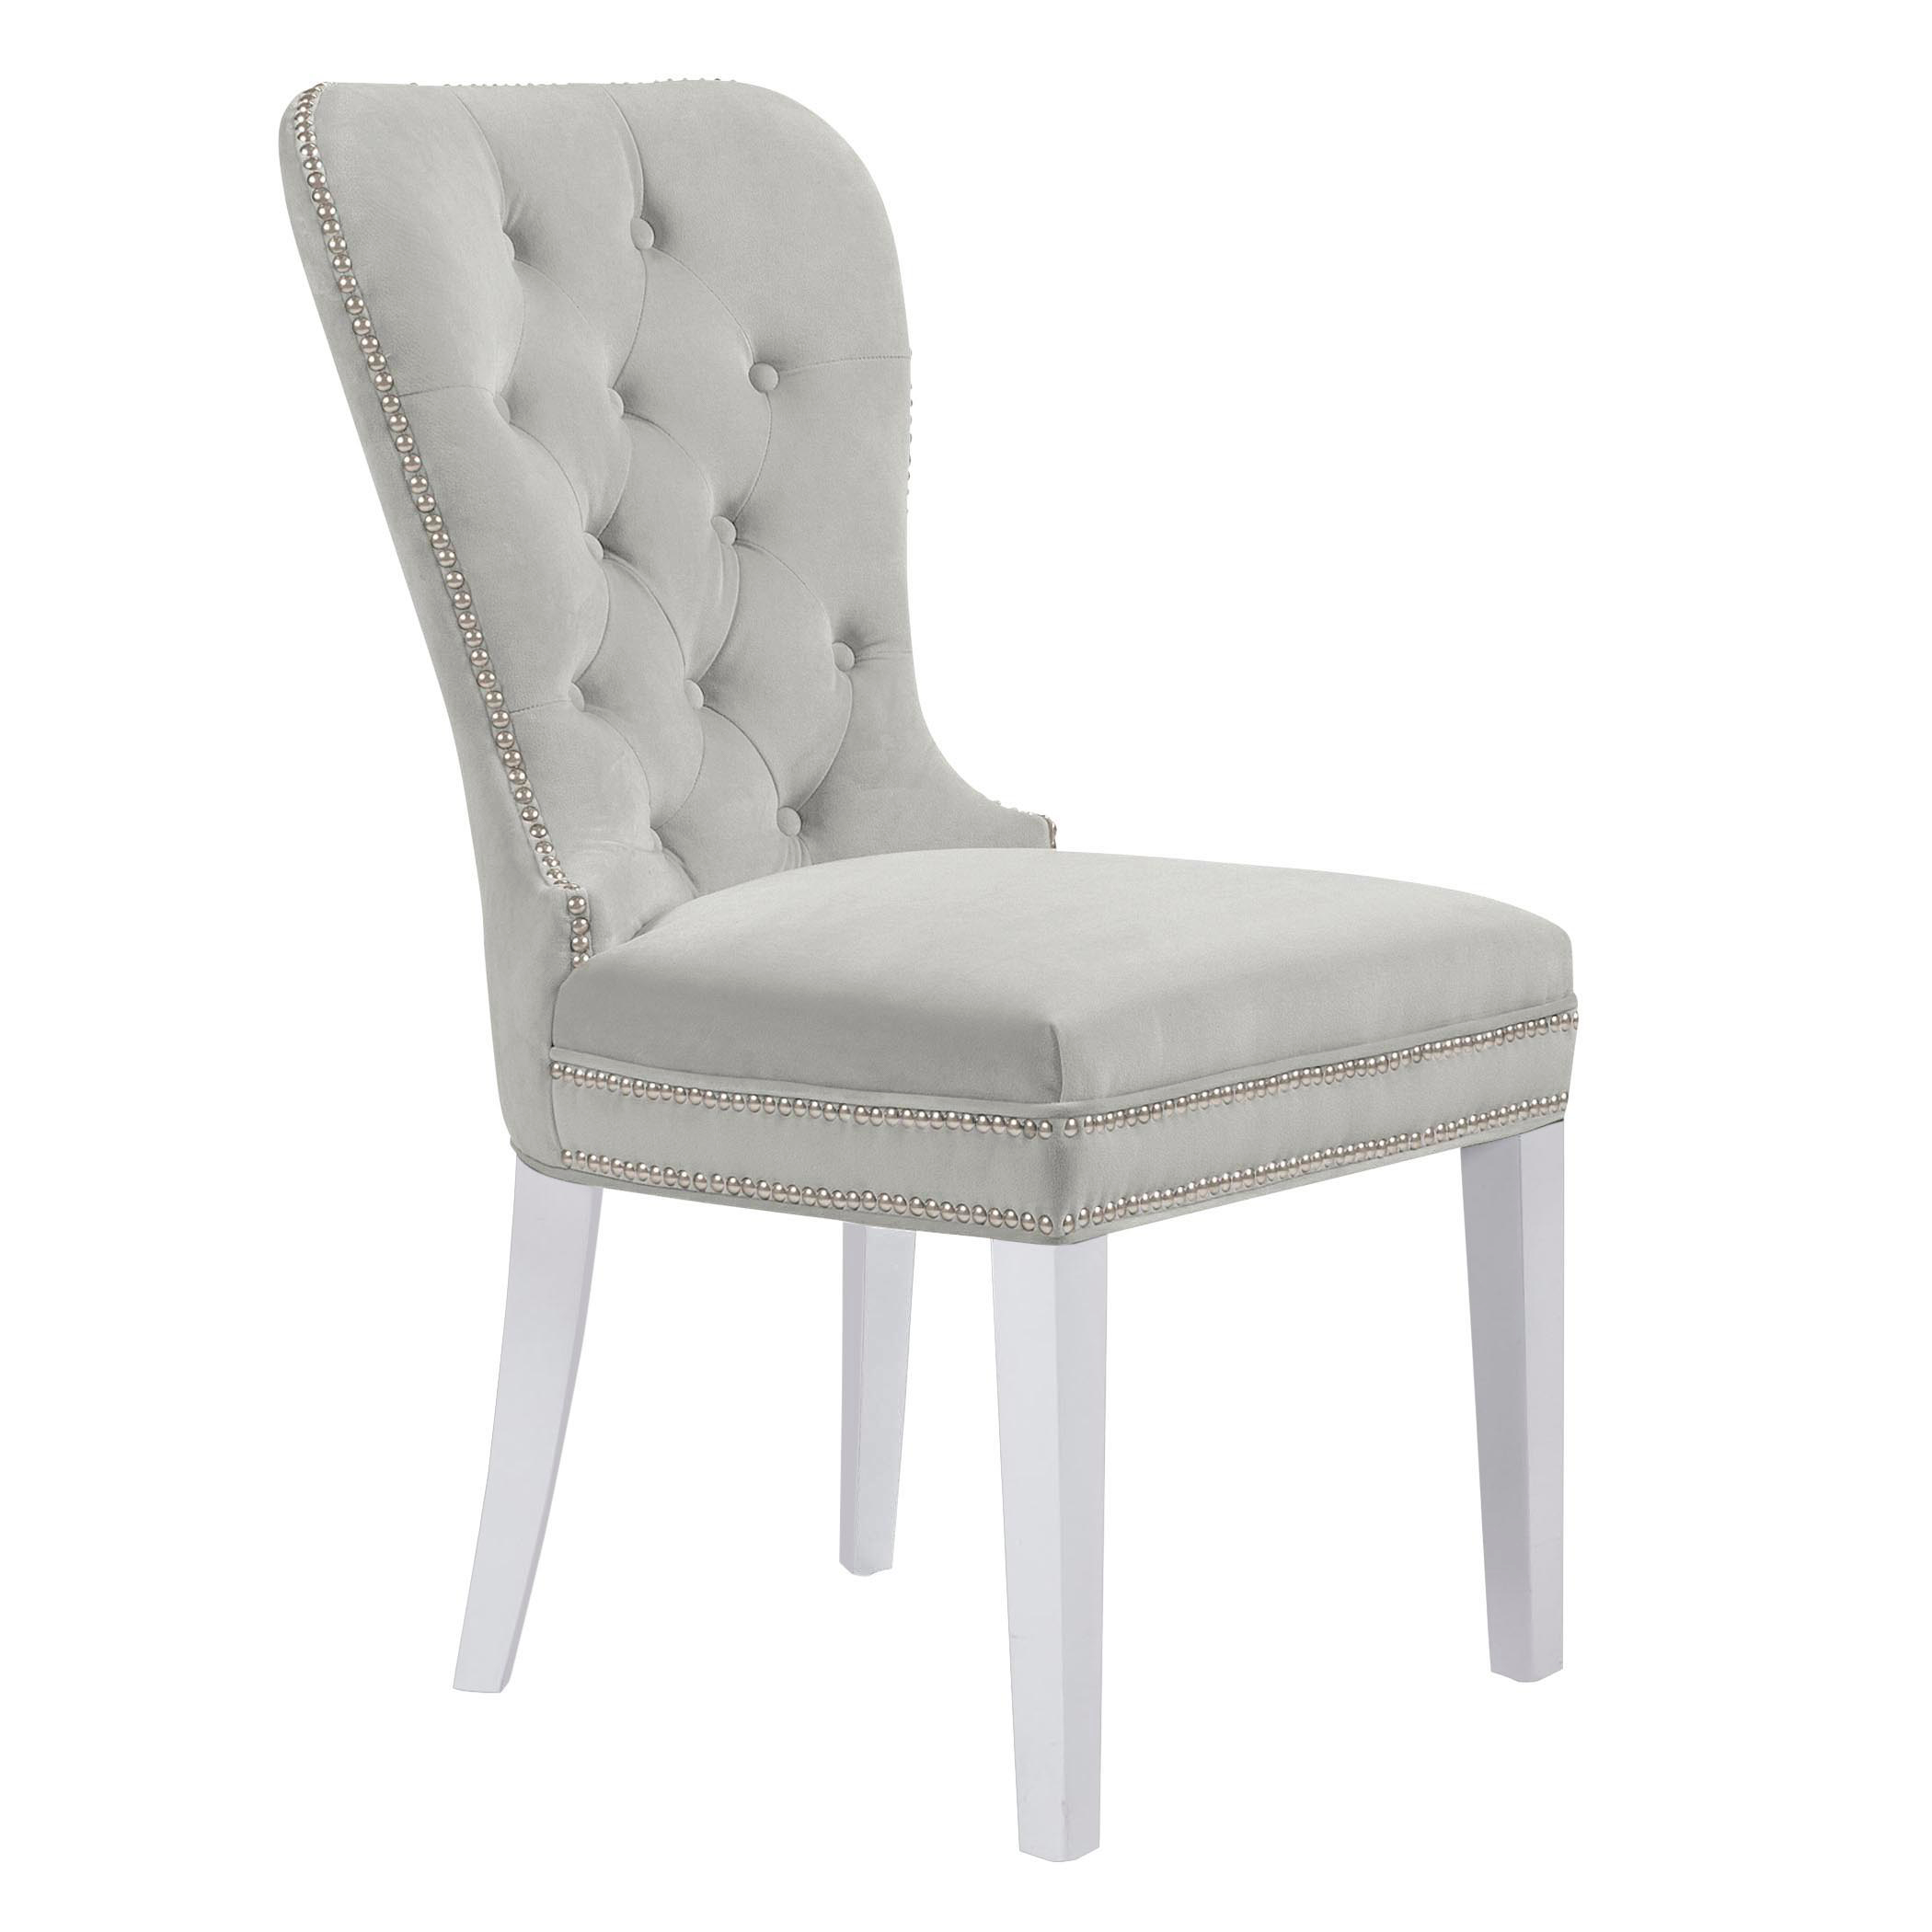 Charlotte Dining Chair - High Gloss White